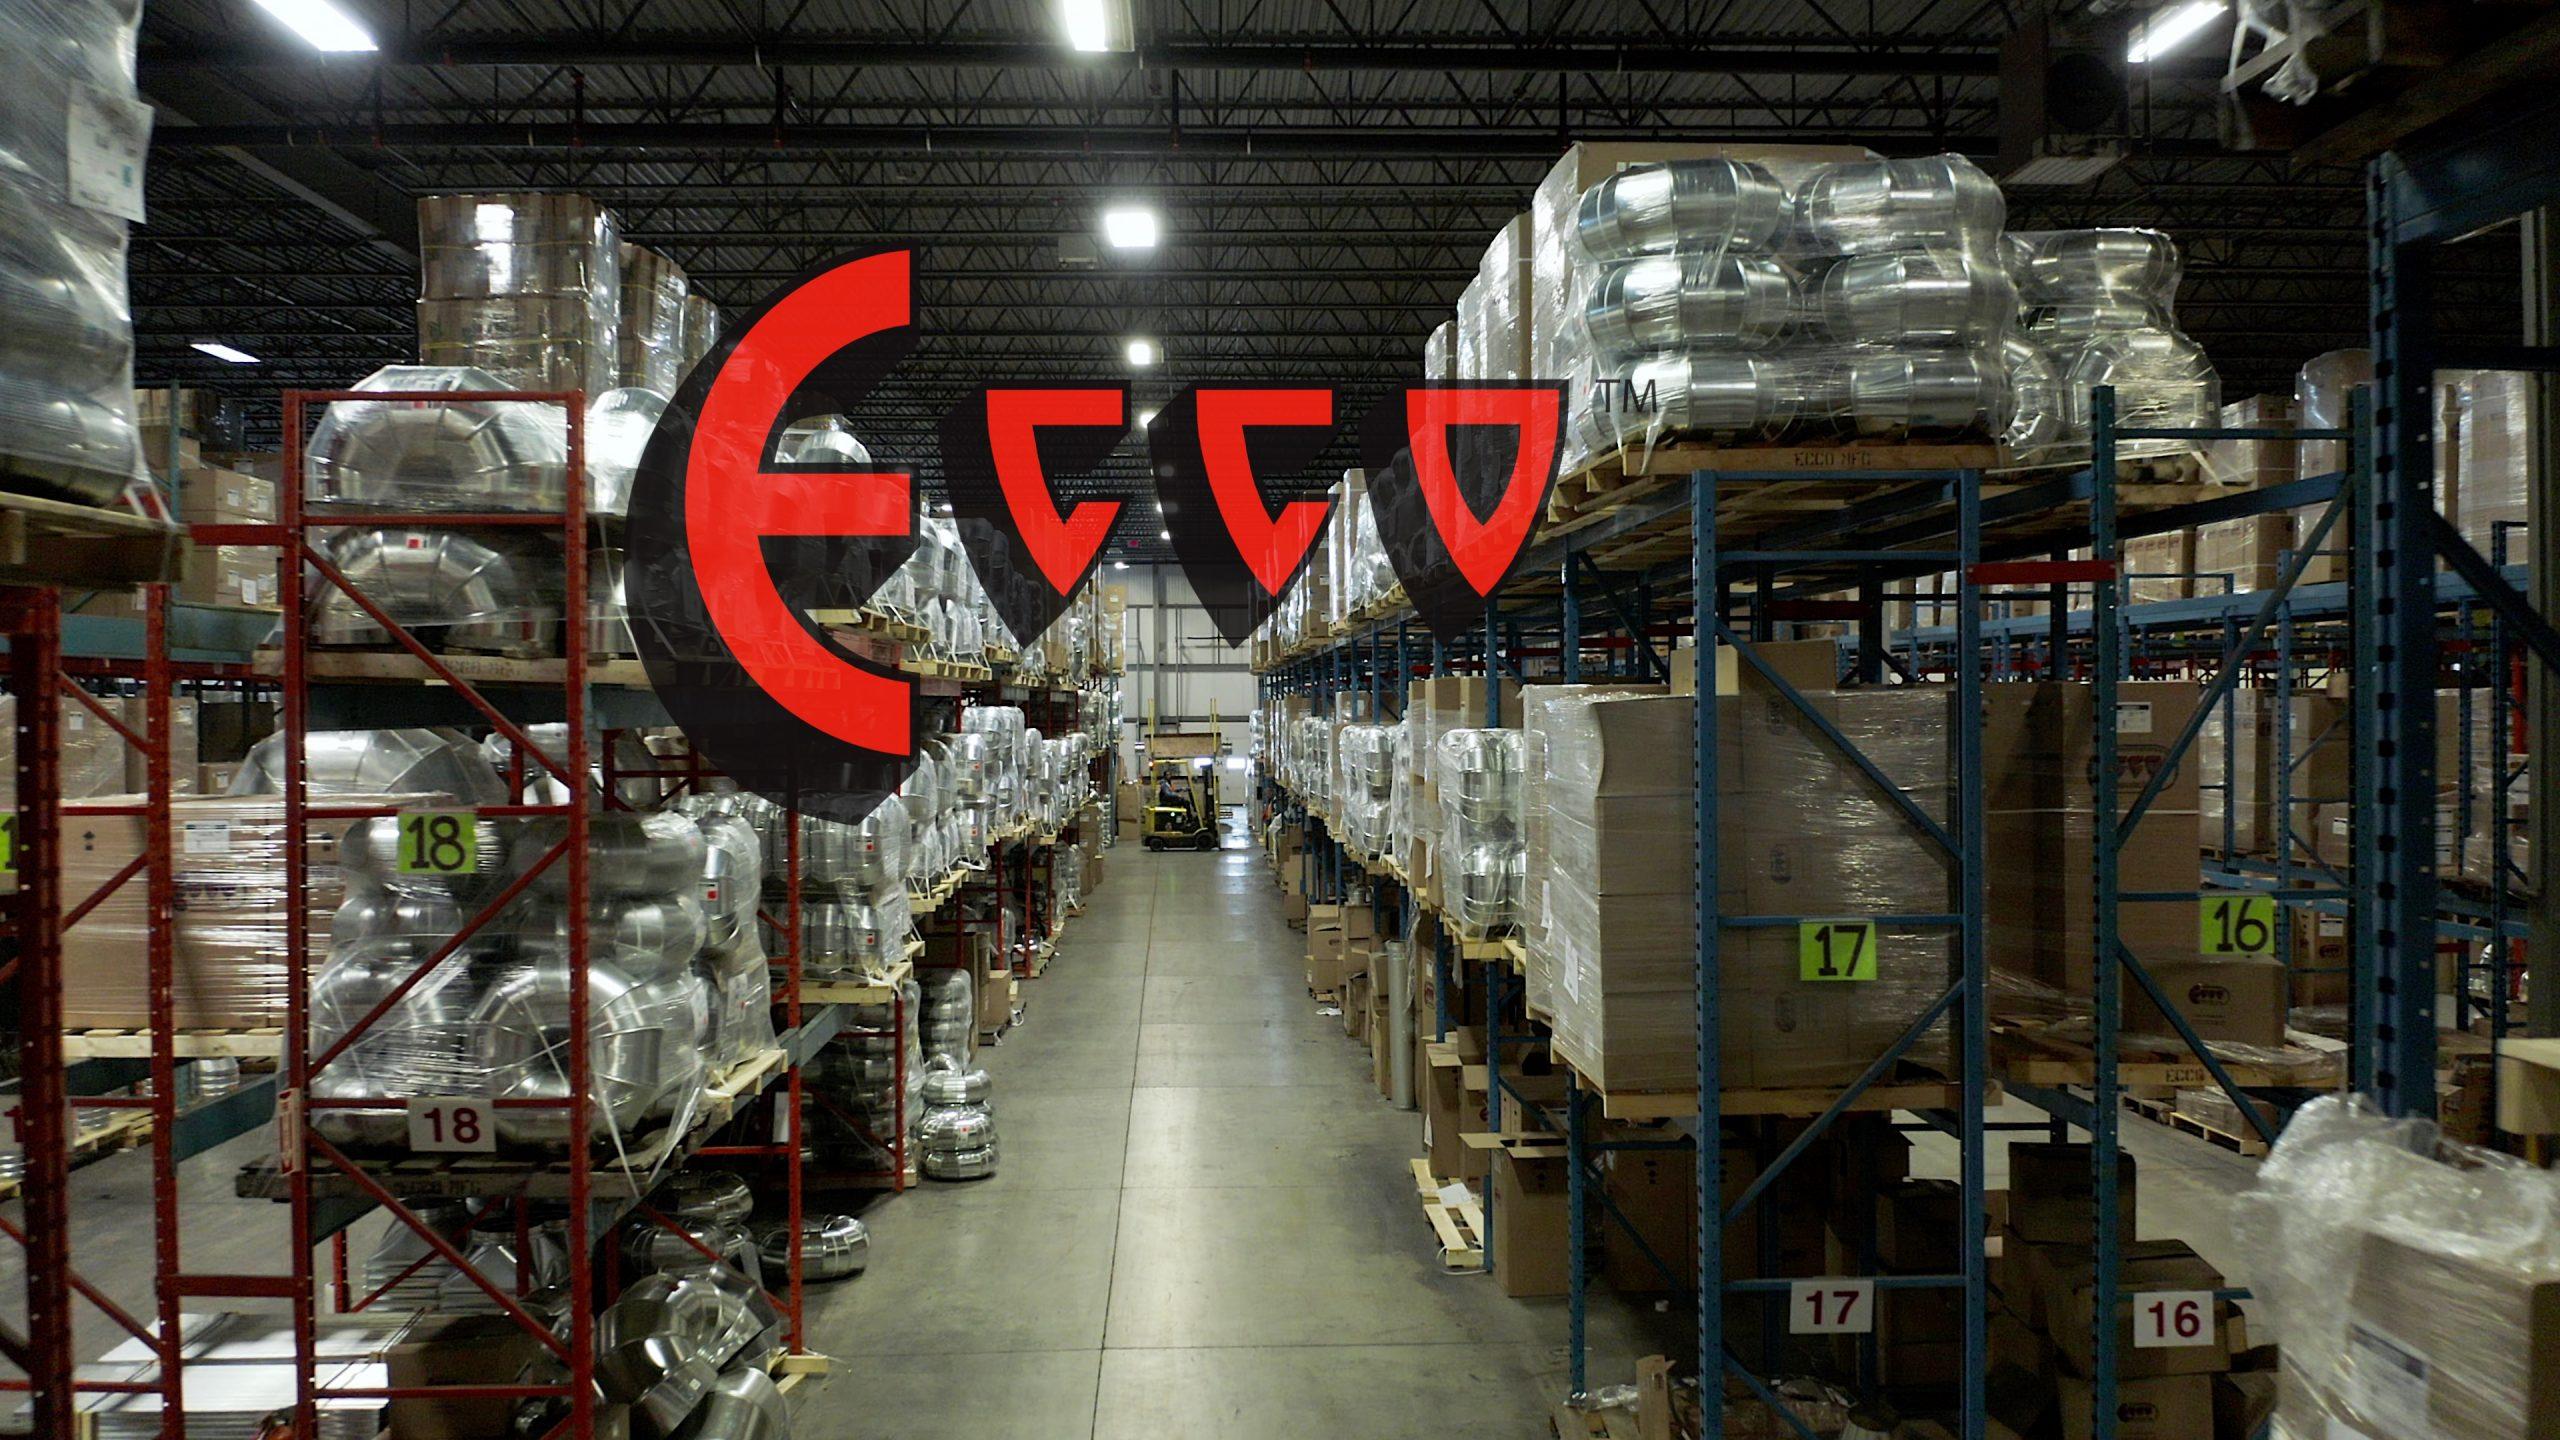 ECCO warehouse video